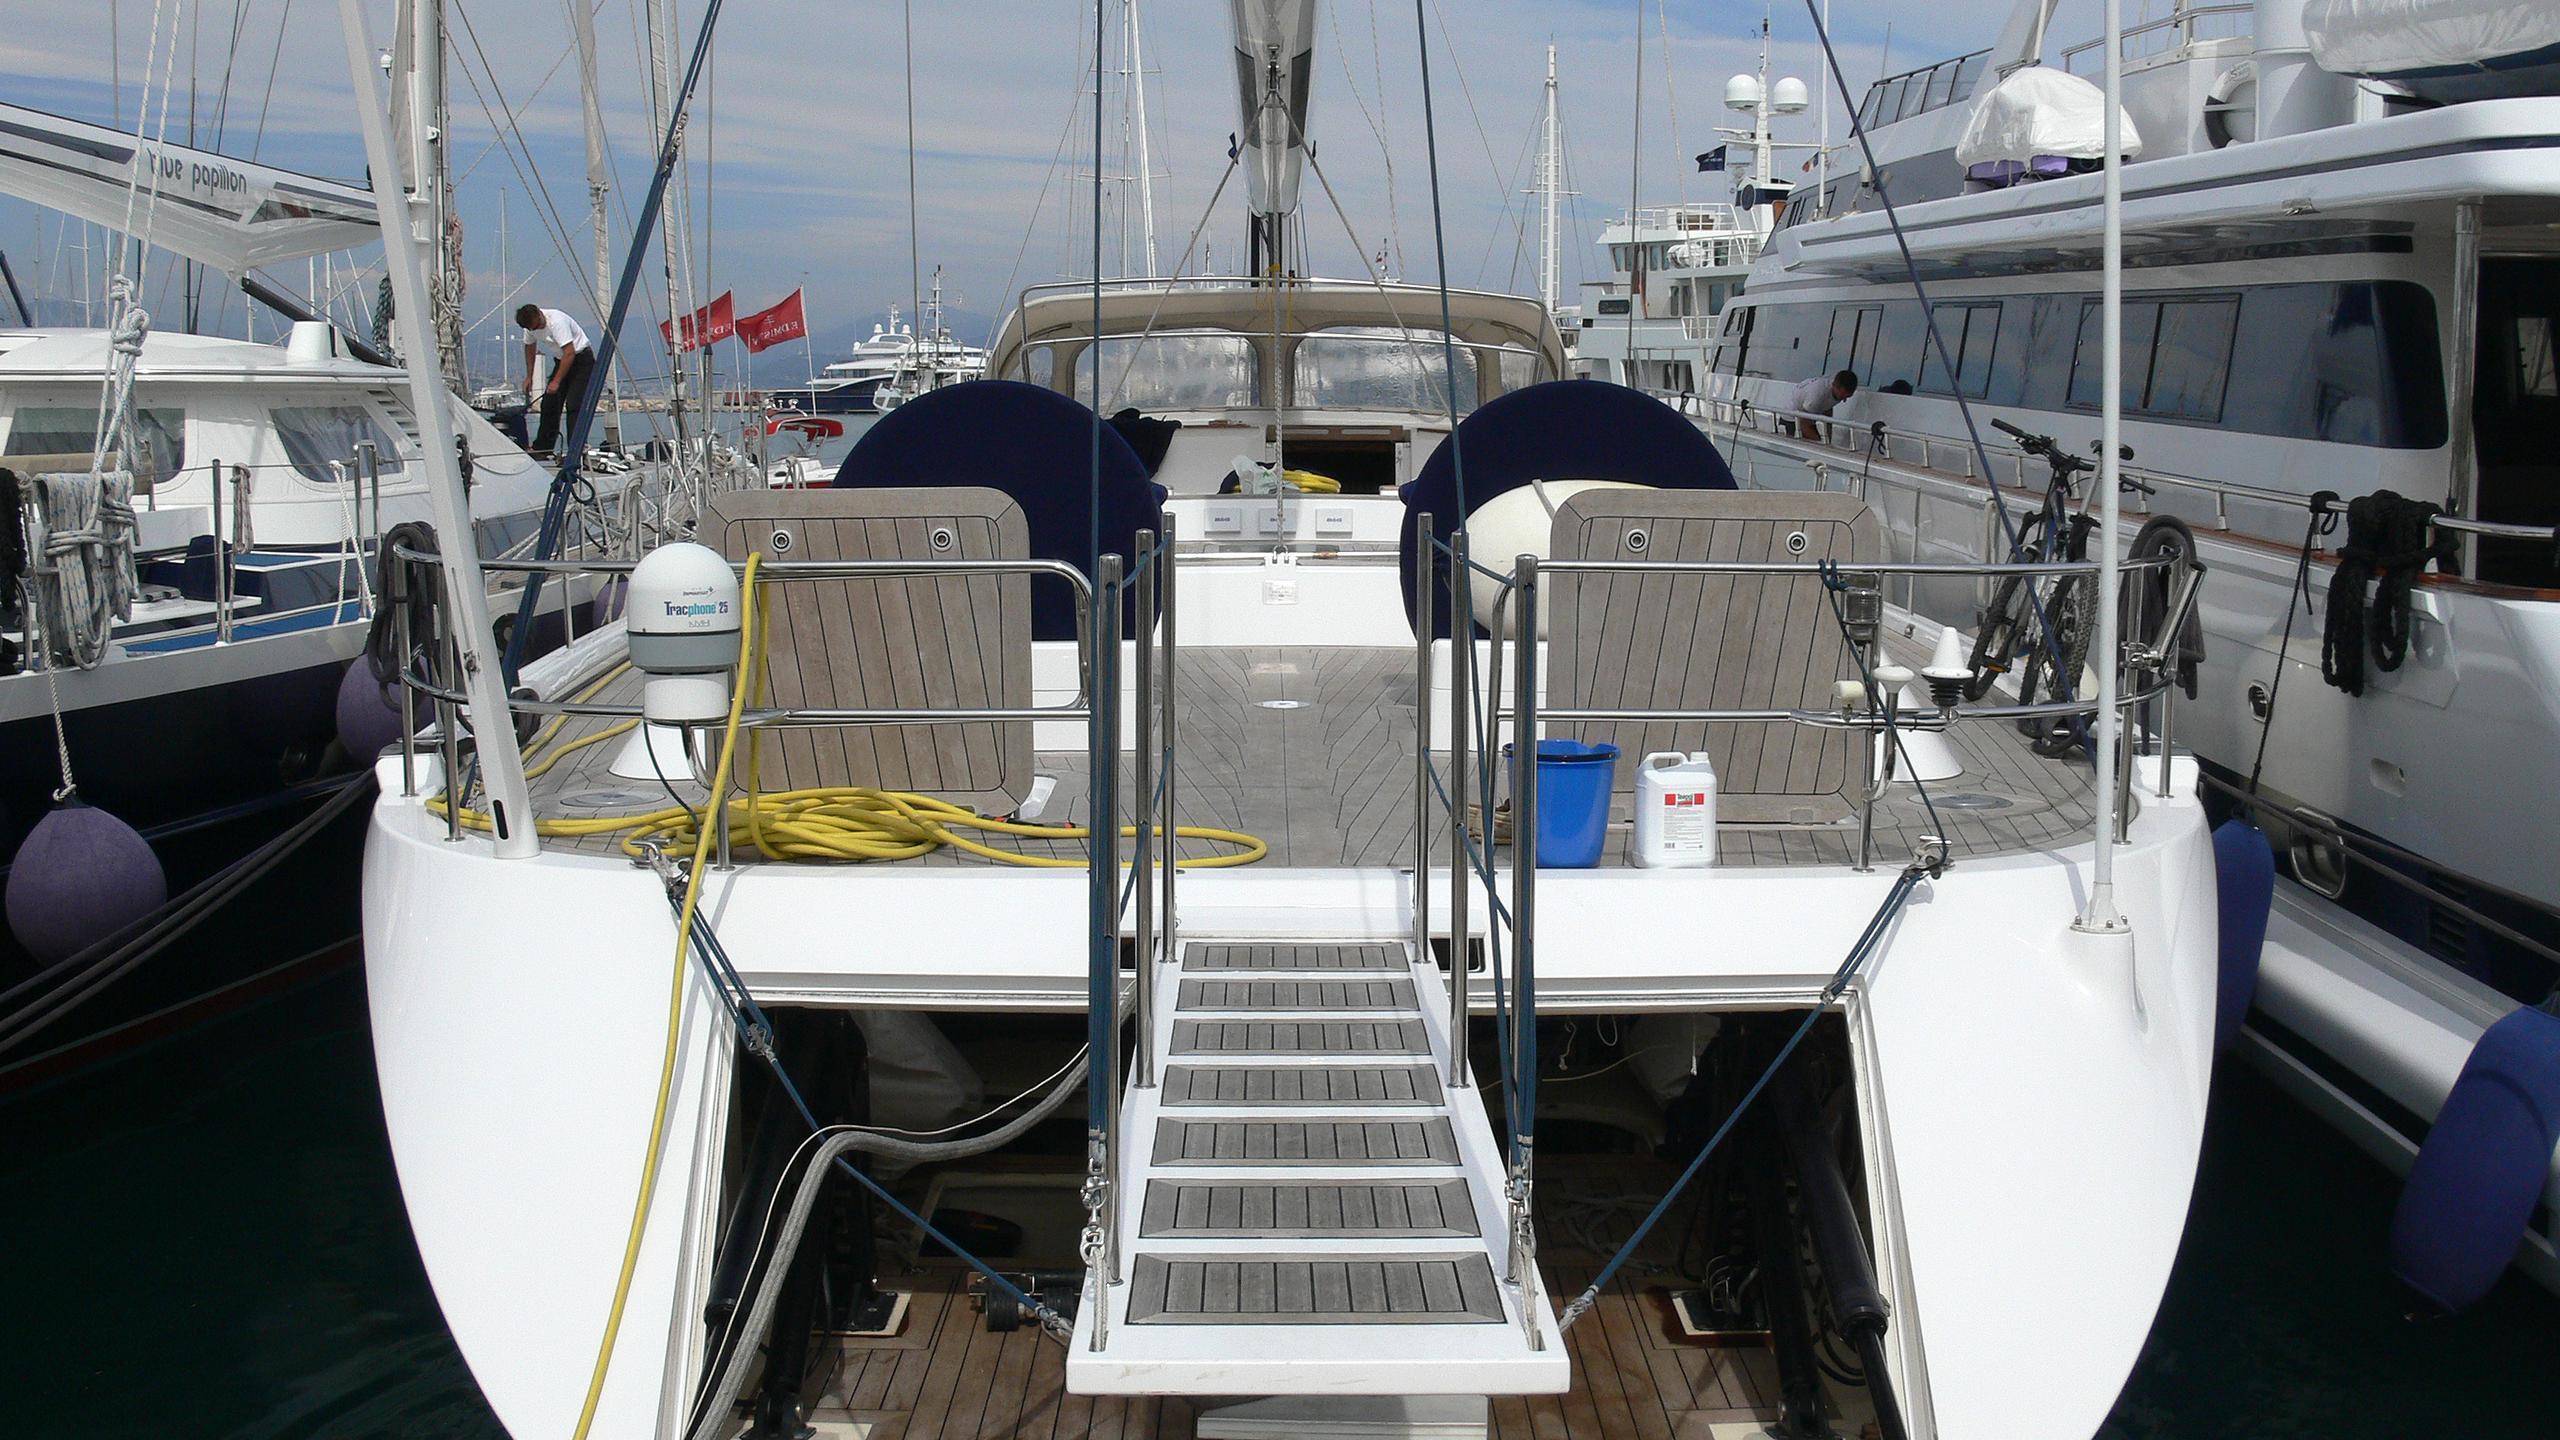 gibian-sailing-yacht-wally-100-2000-30m-stern